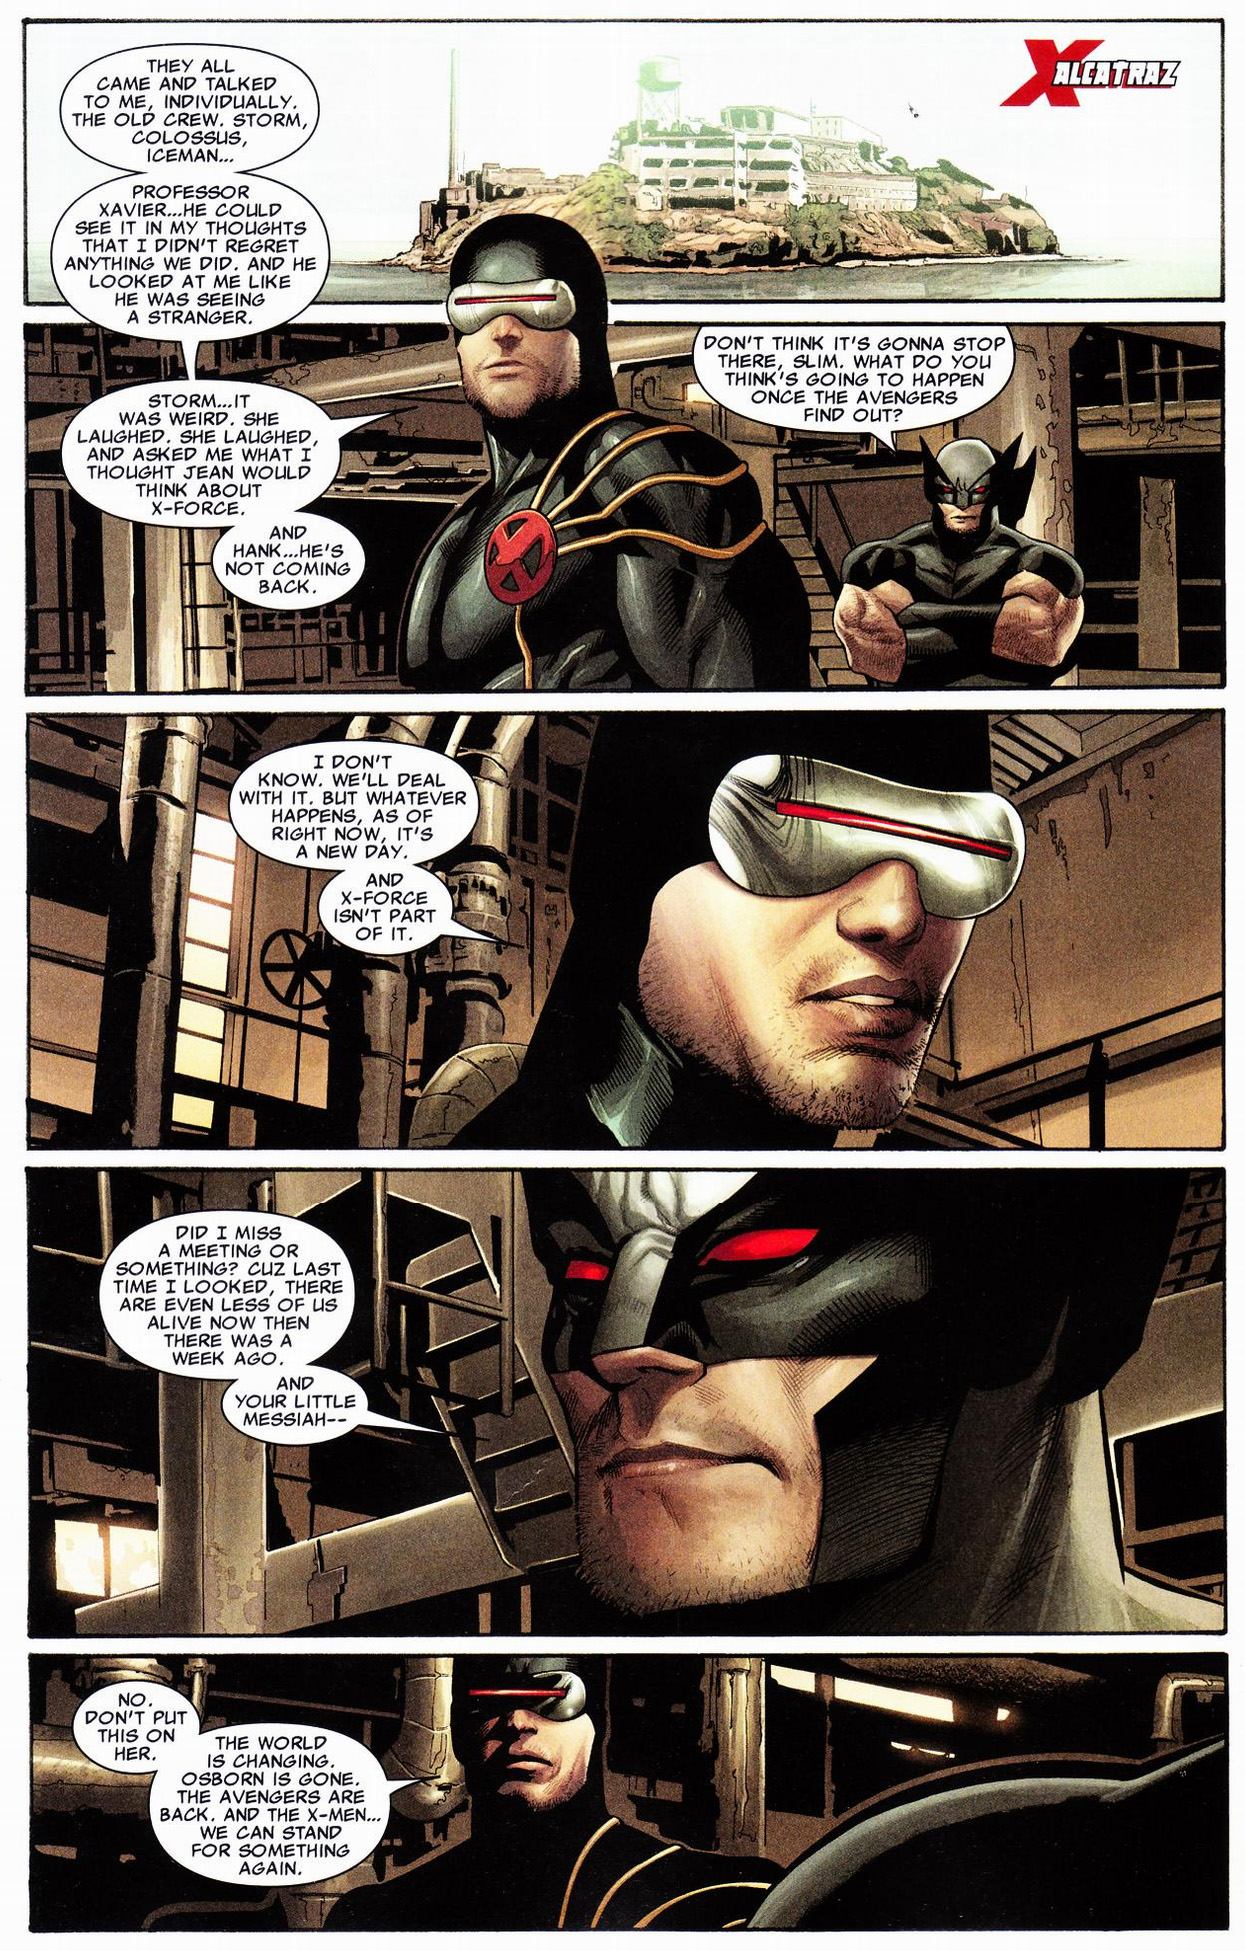 cyclops disbands x-force